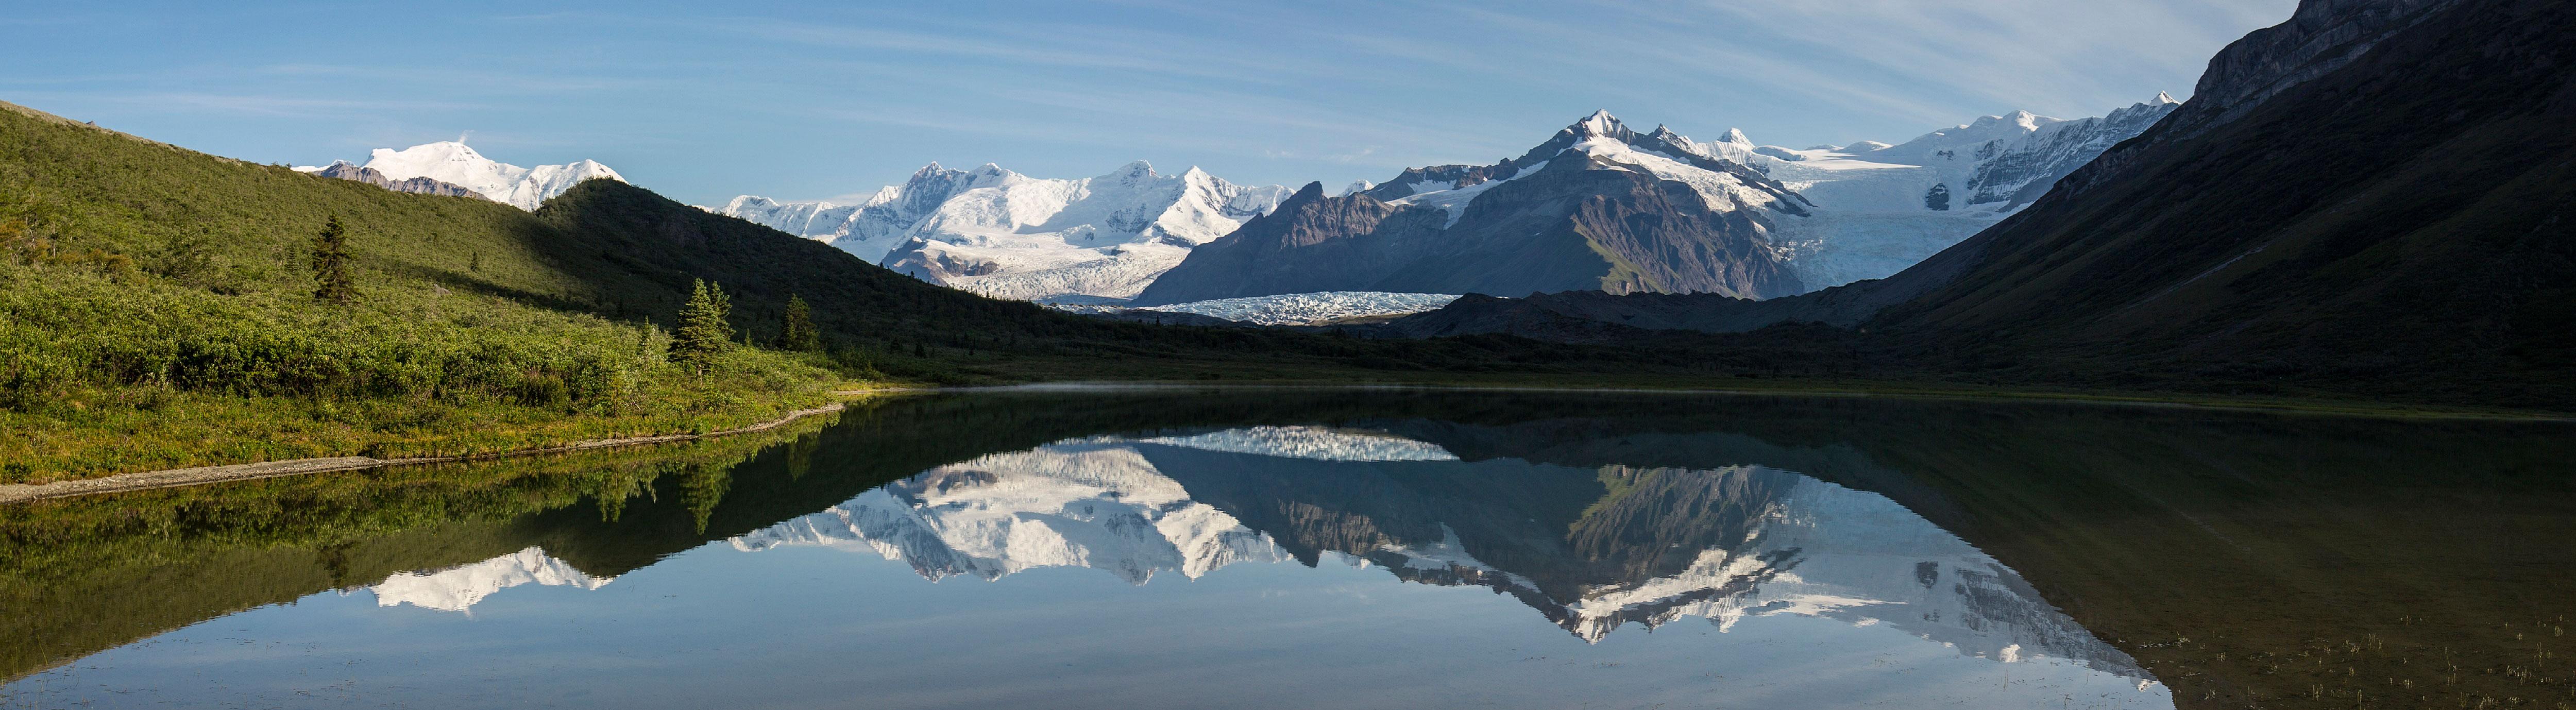 lake-landscape-1071686_